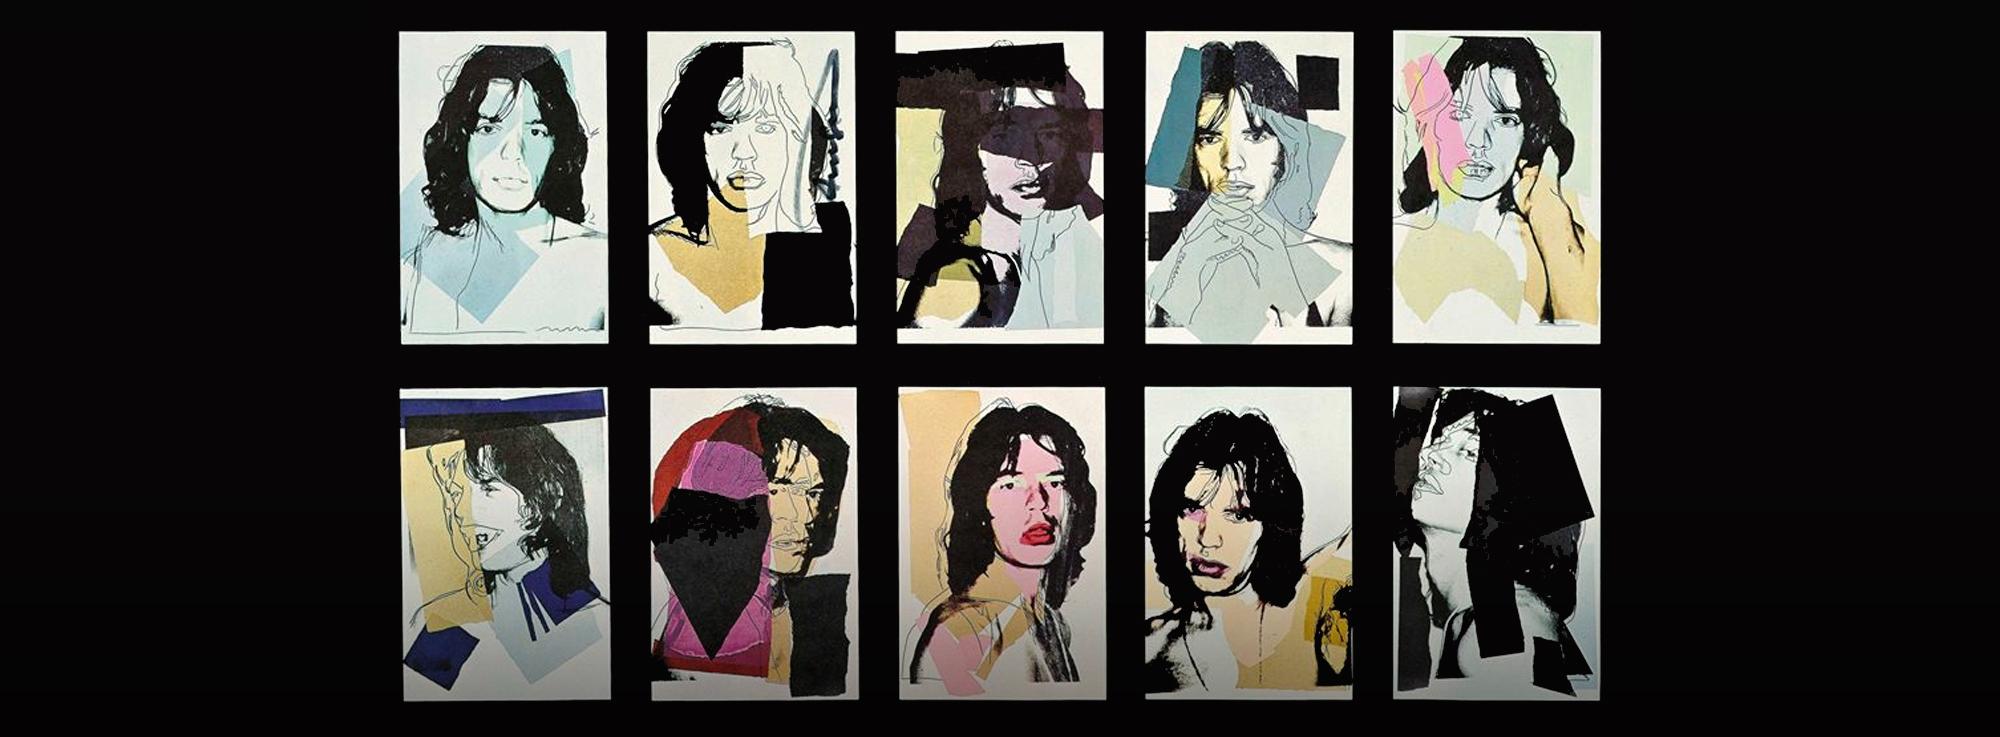 Mesagne, Ostuni, Martina Franca: Andy Warhol. L'alchimista degli anni Sessanta